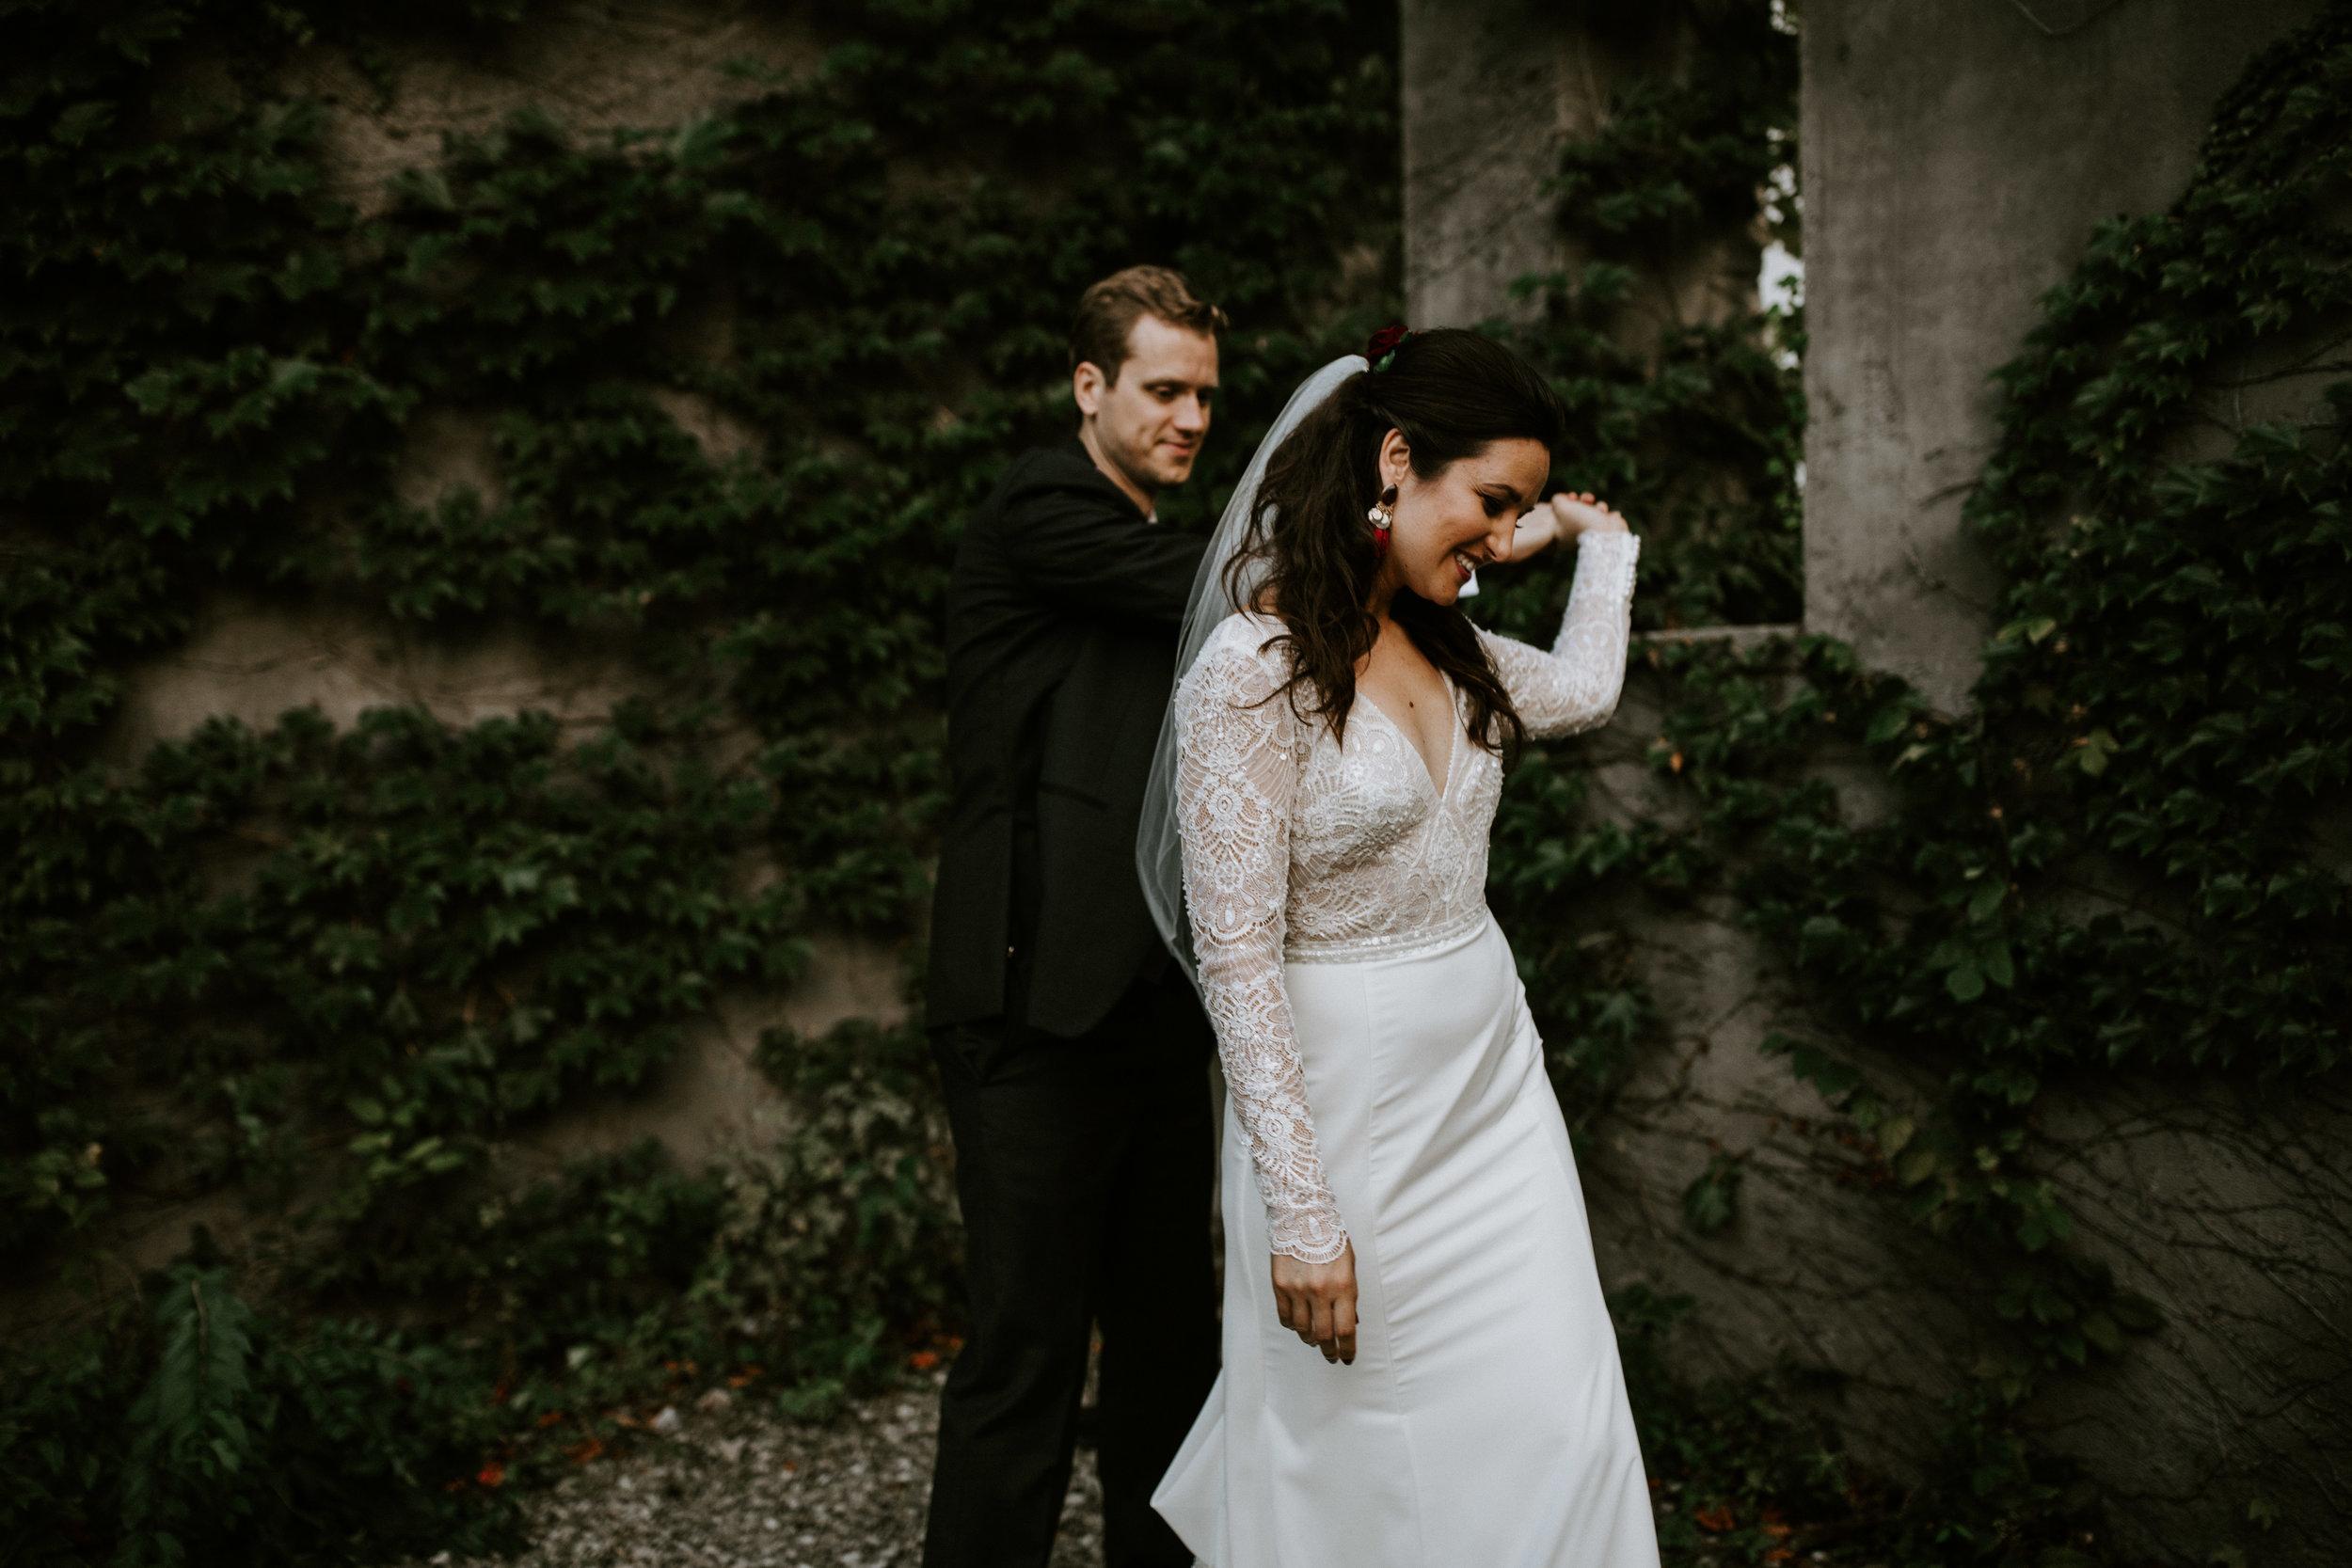 st-louis-missouri-wedding-photographer-tower-grove-park-sheldon-concert-hall-steph+phil-861.jpg